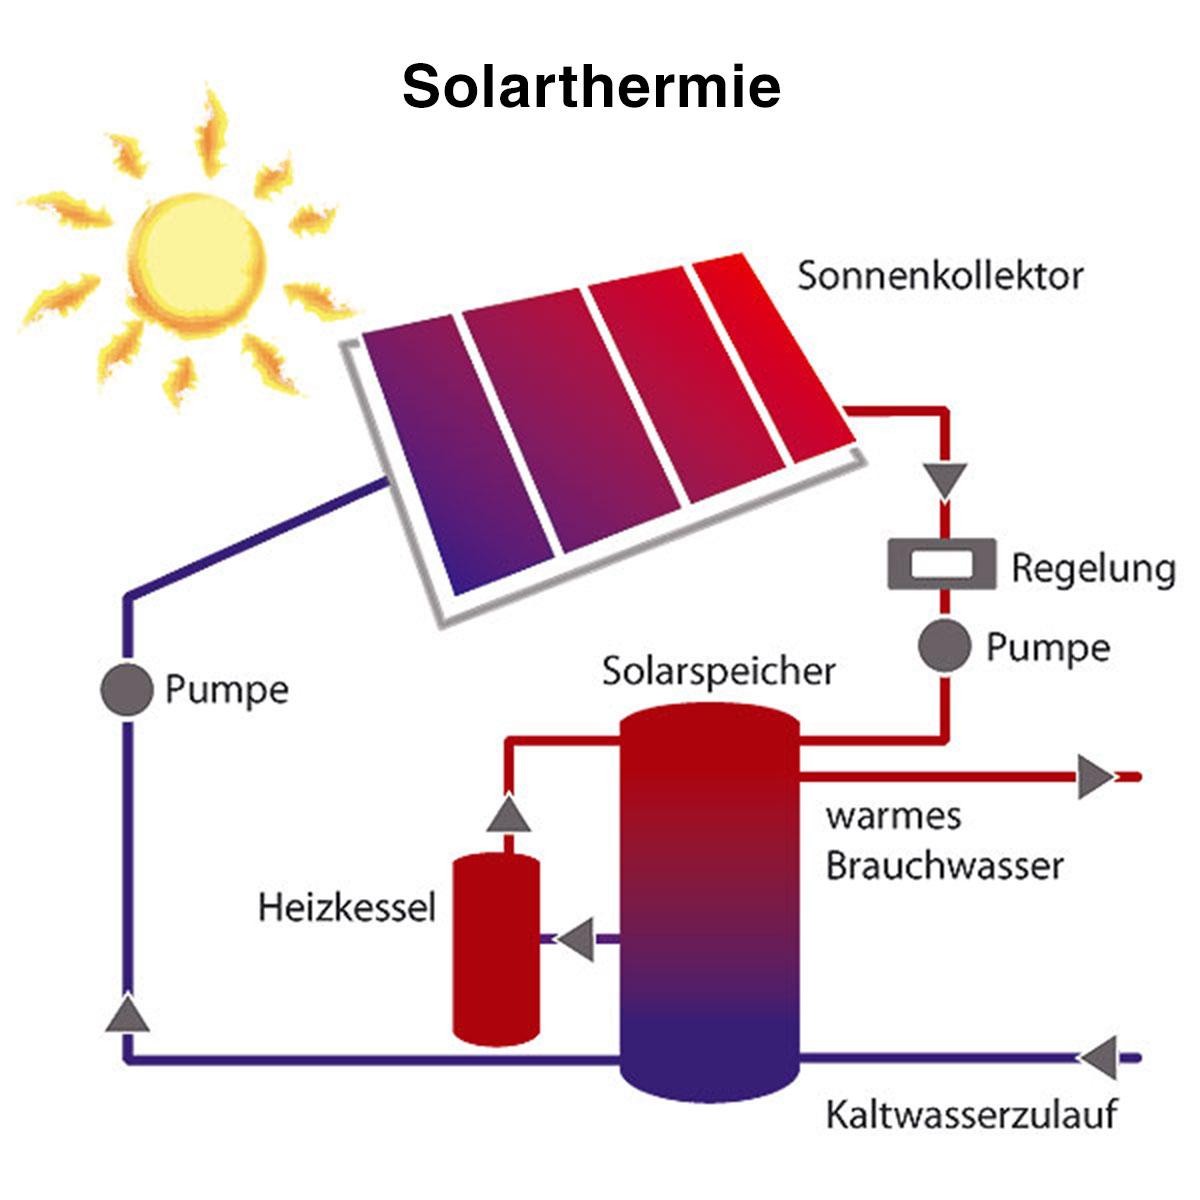 Funktionsweise der Solarthermie